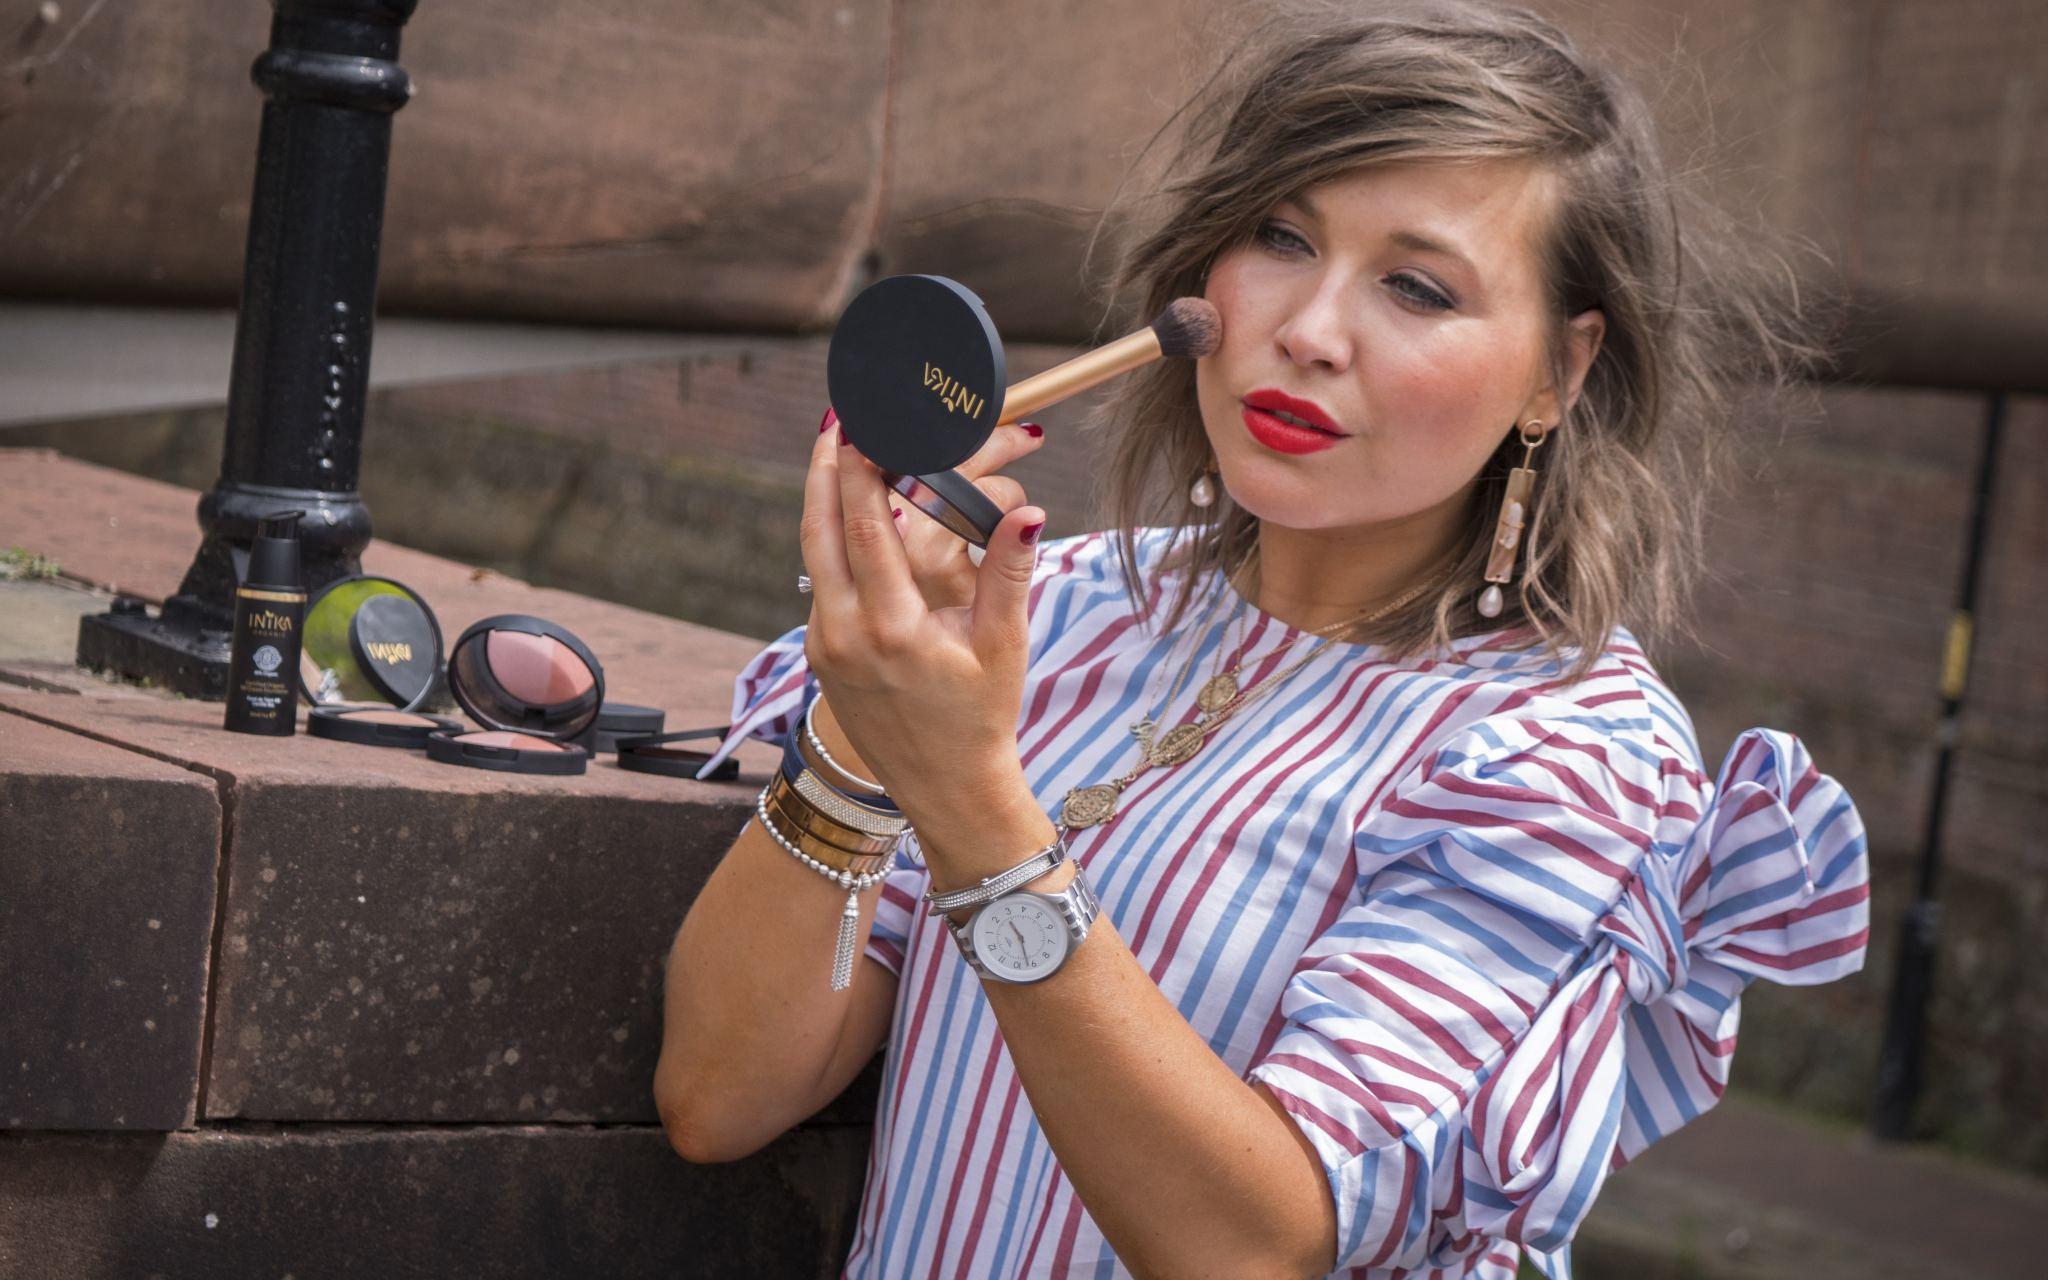 manchester fashion blogger, fashion blogger, fashion trends, make up , inika make p, organic makeup, fblogger, manchester